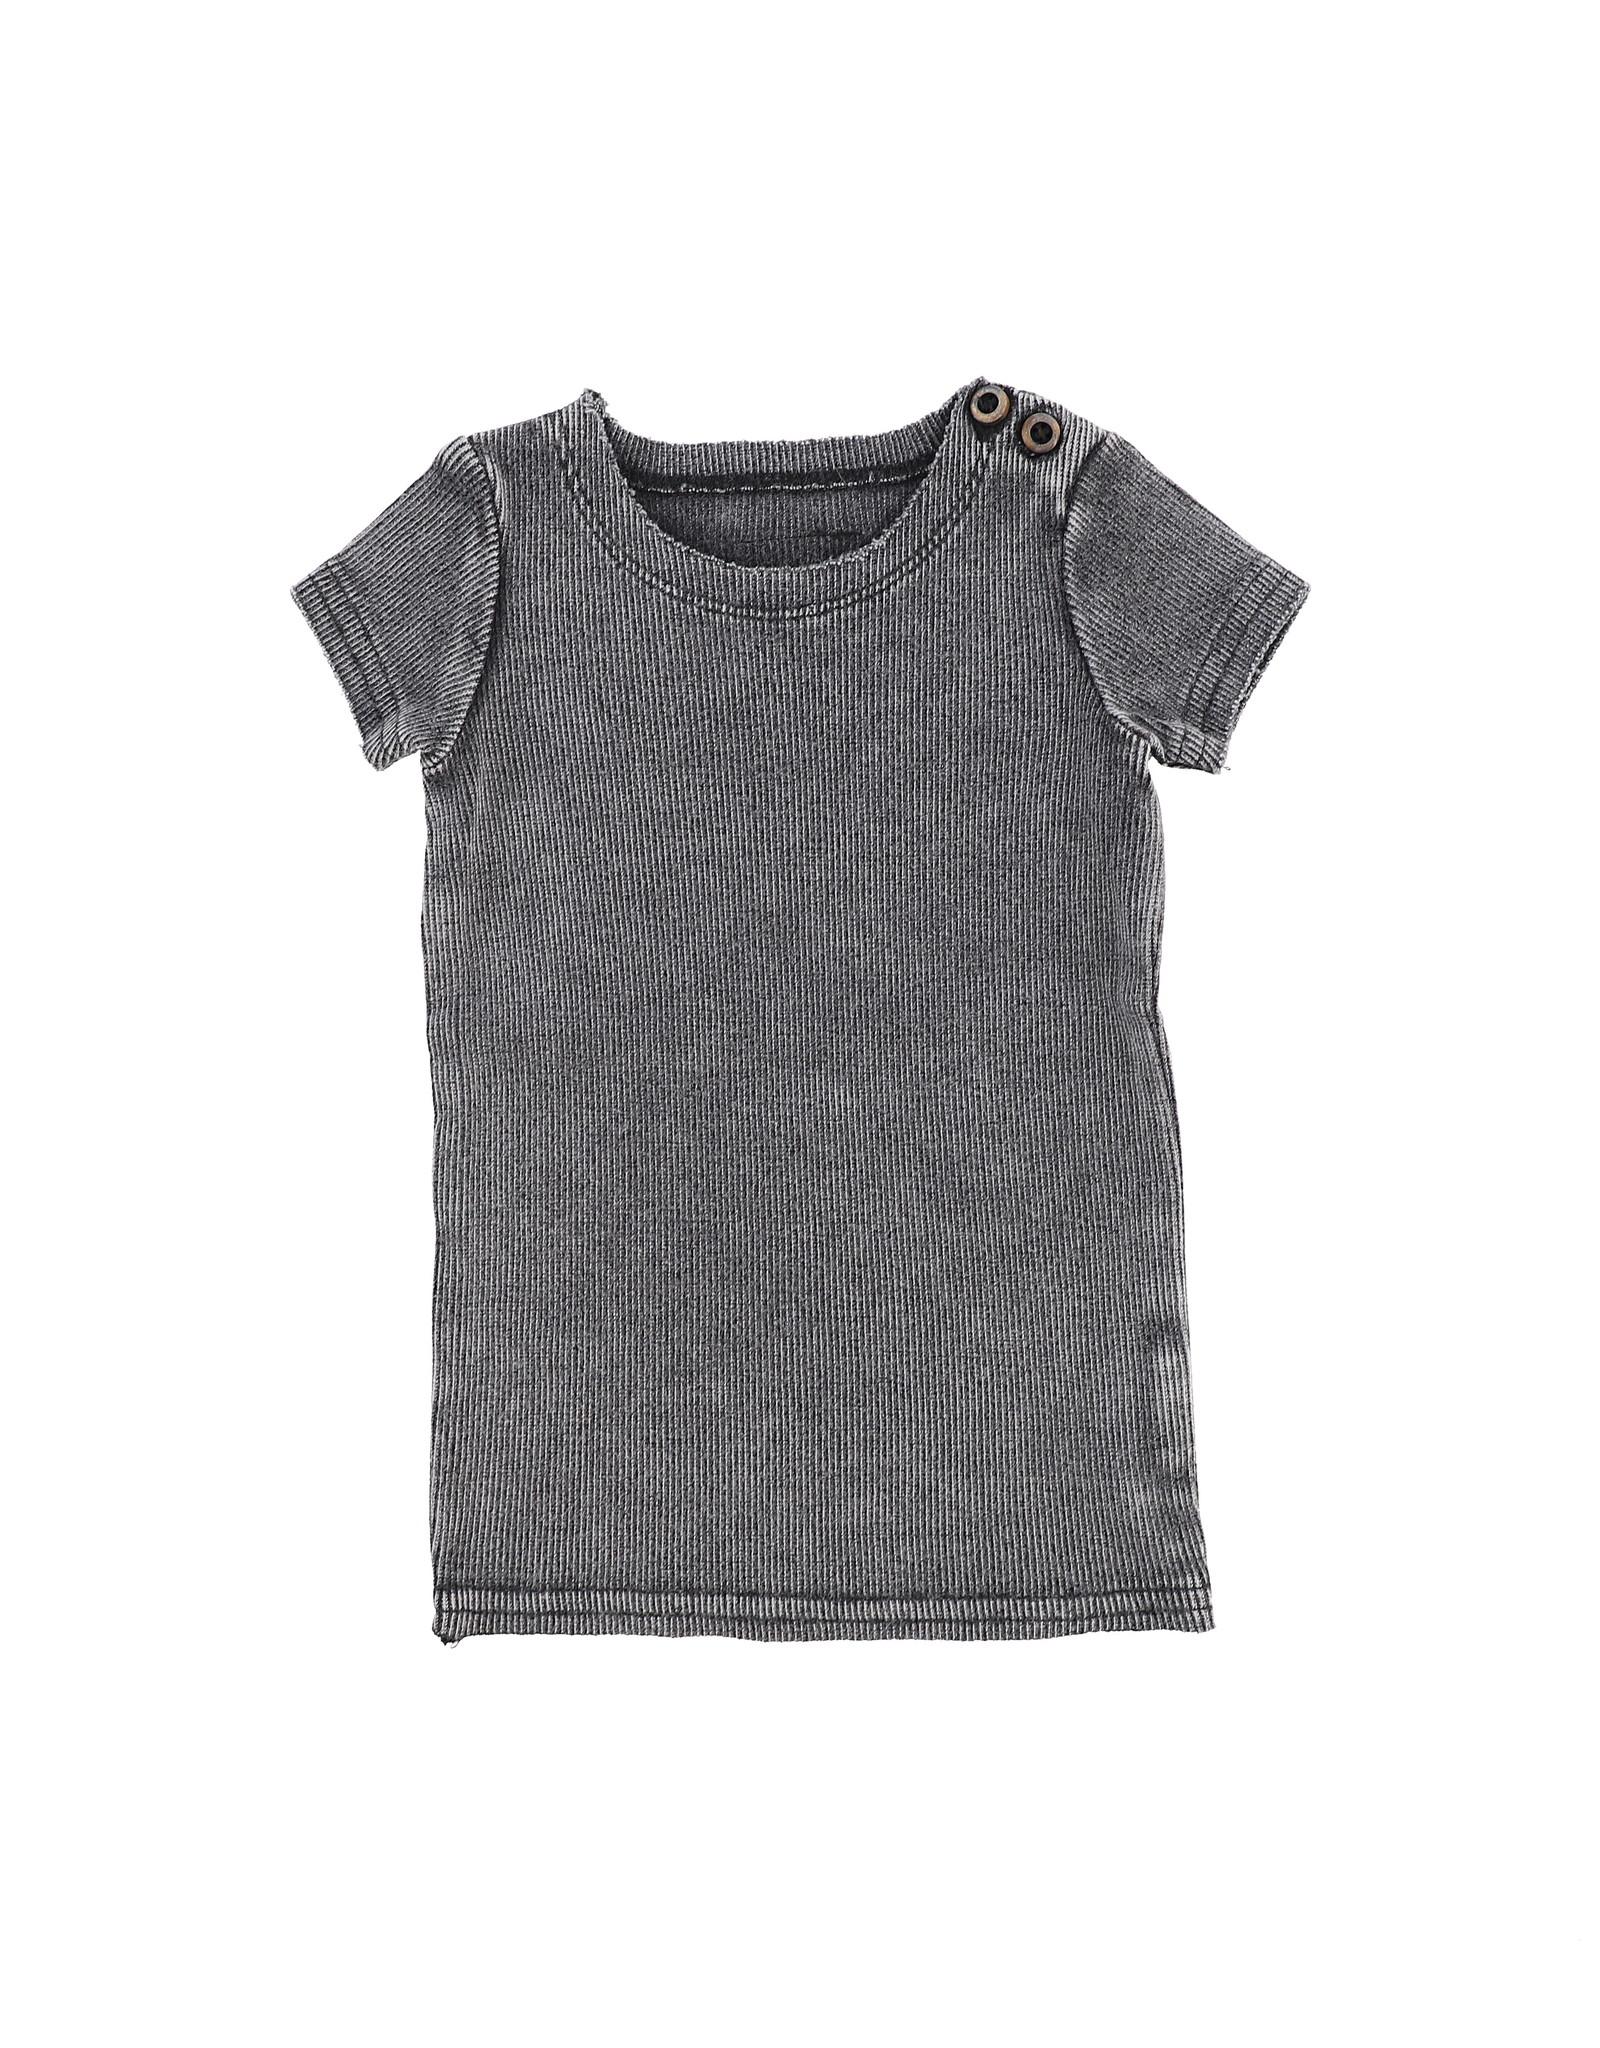 LIL LEGS SS20 Stonewash Short Sleeve Ribbed T-Shirt